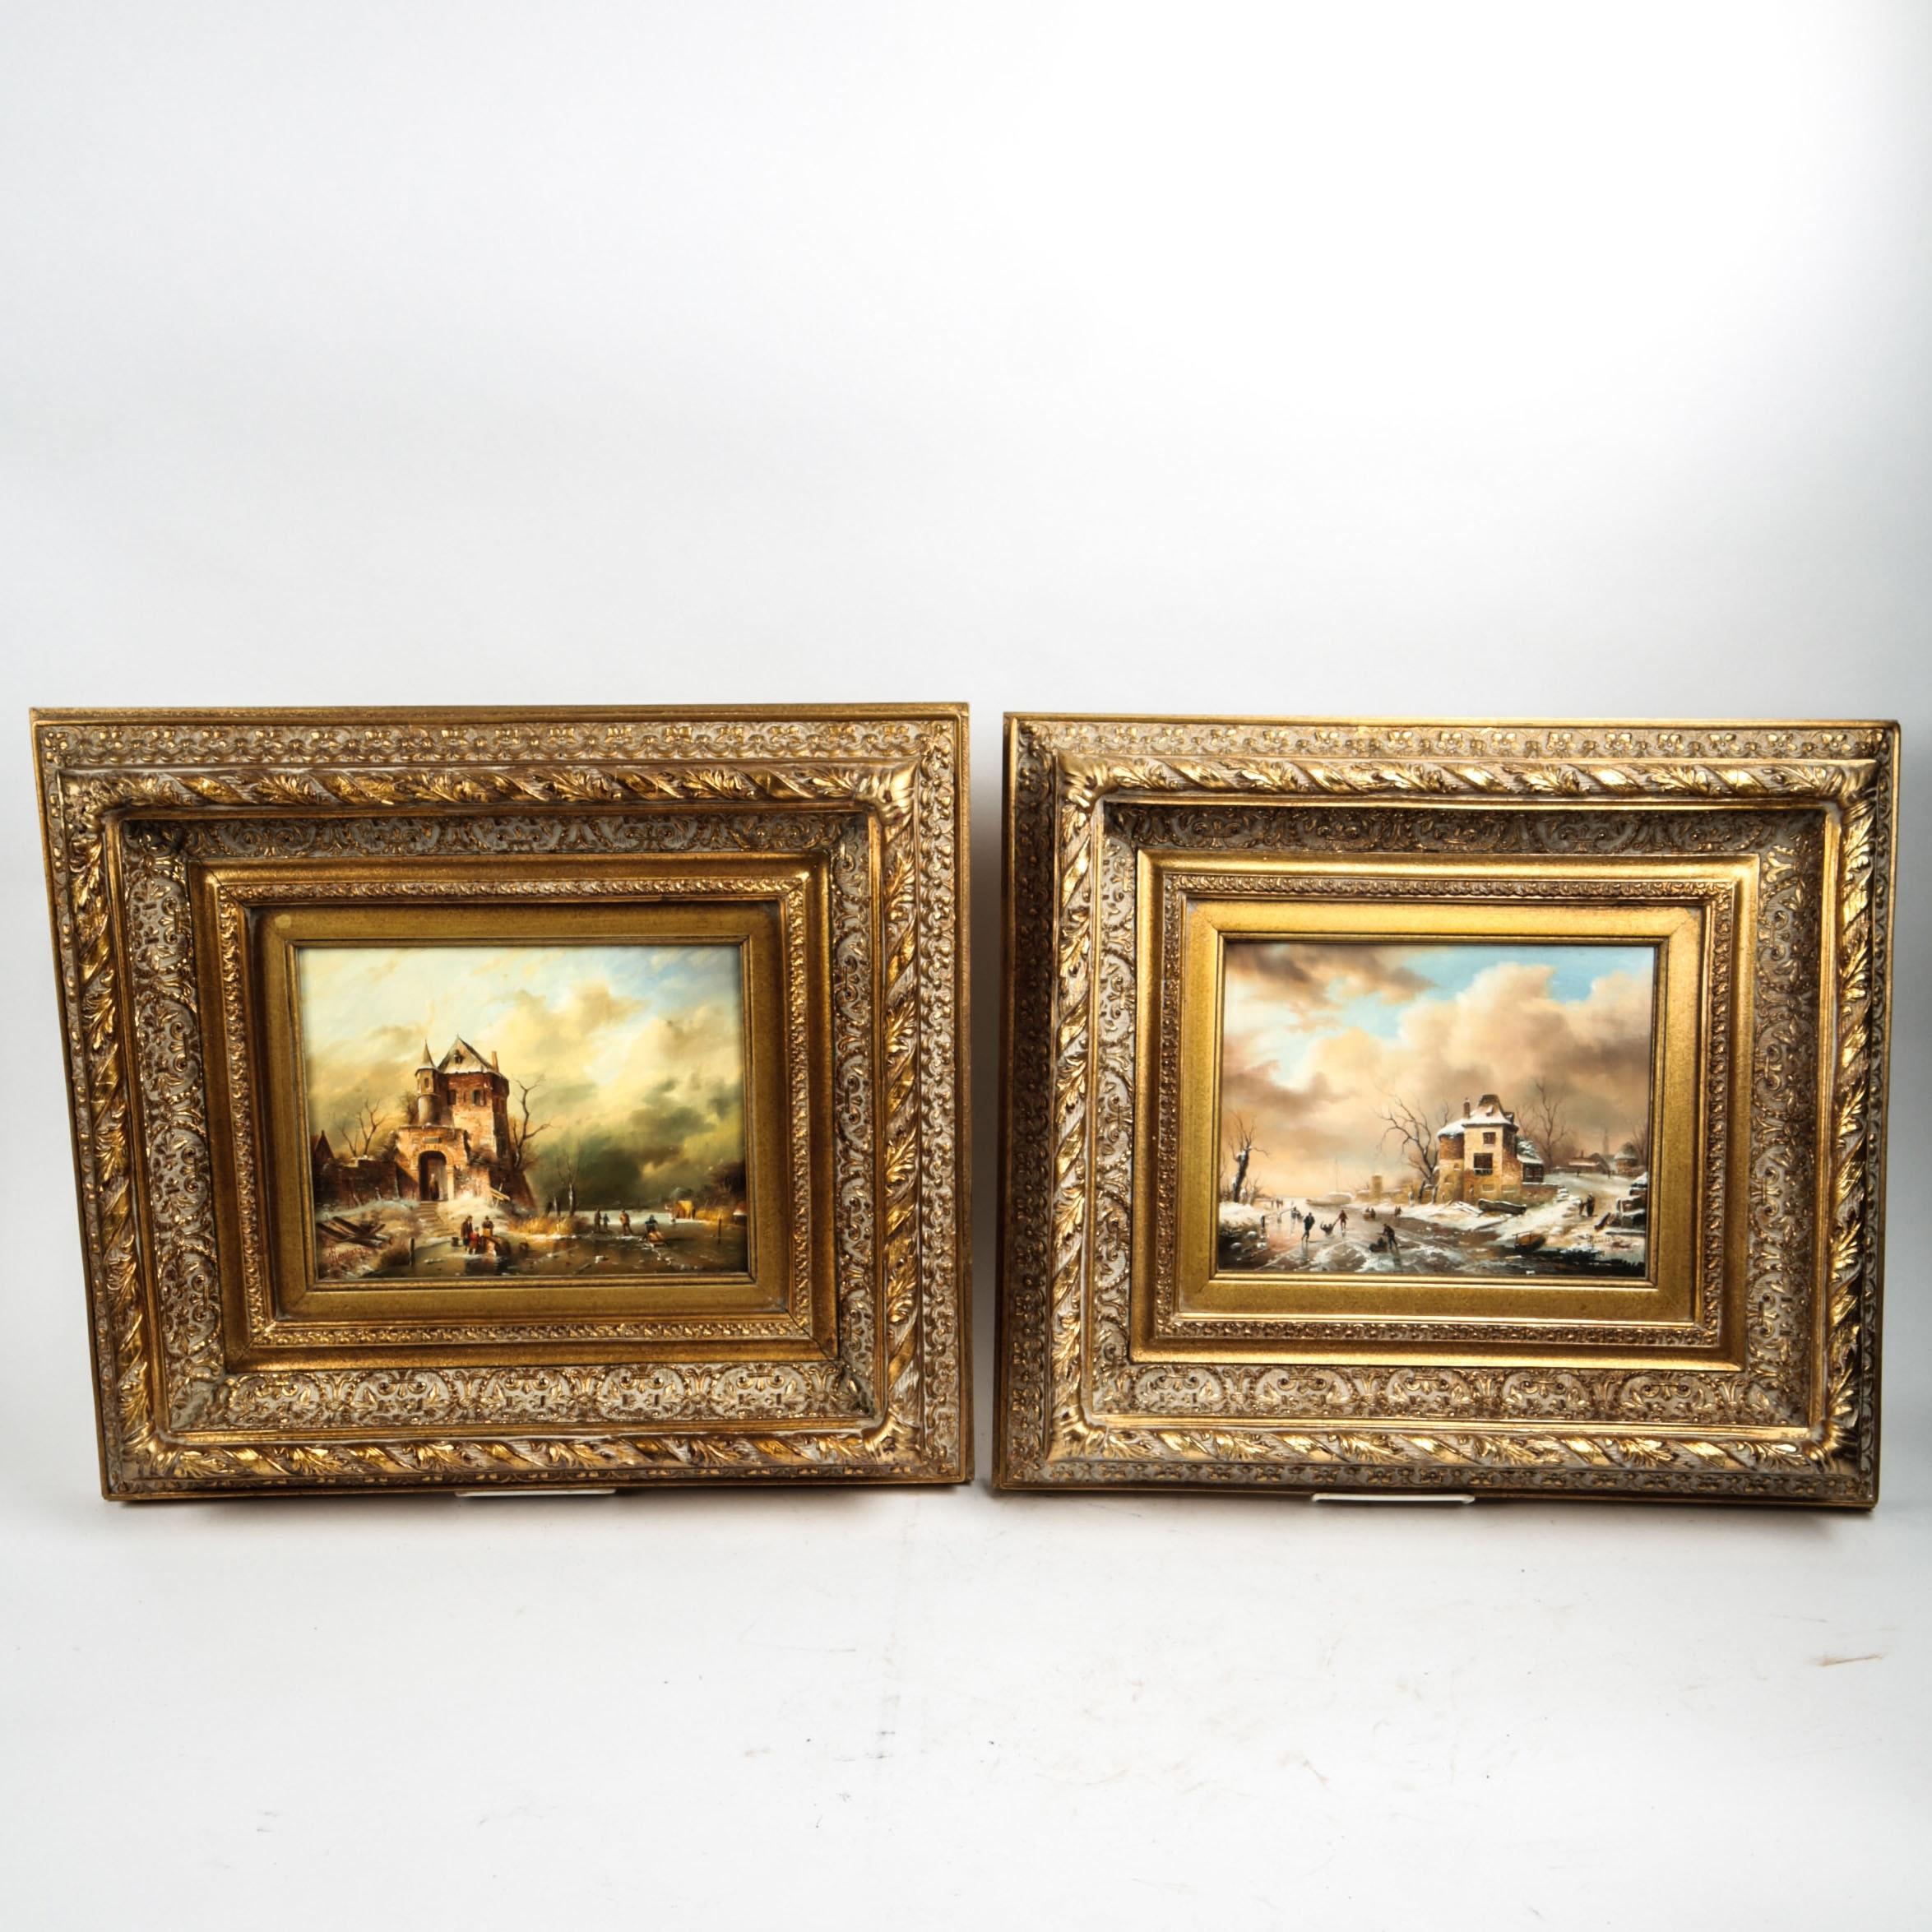 Pair of Henry Ramirez Jr. Signed Oil Paintings